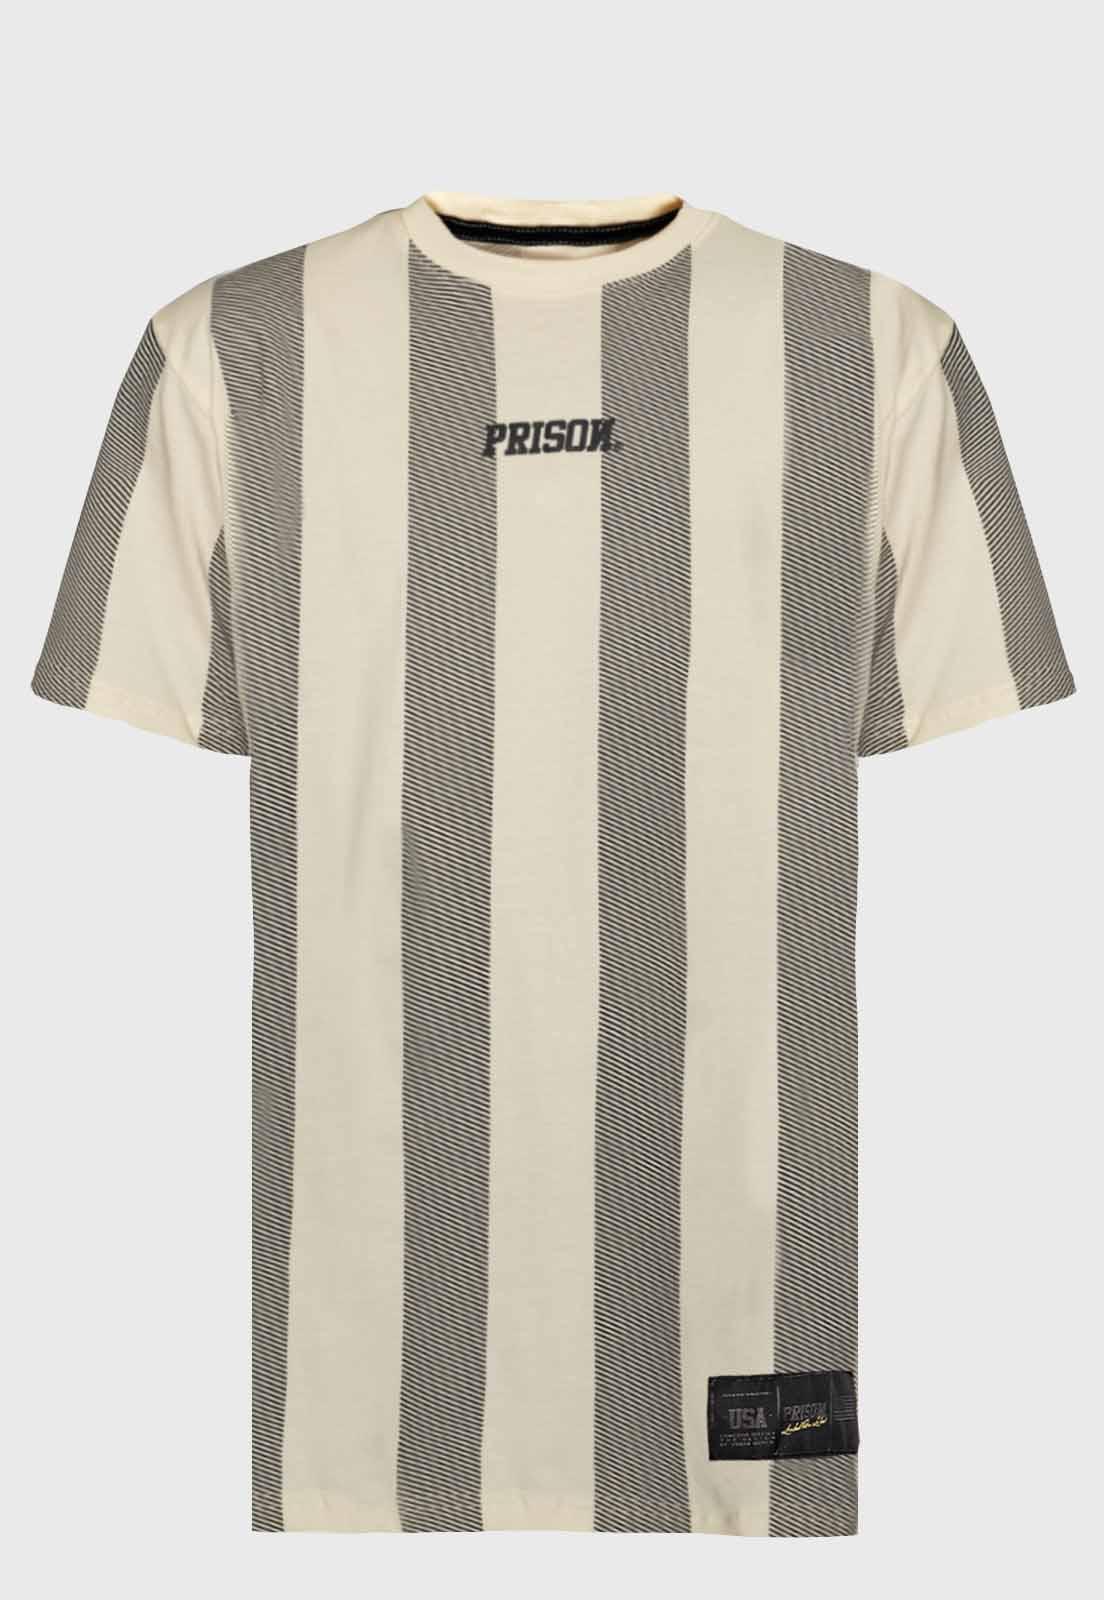 Camiseta Prison Listrada Long Off-White